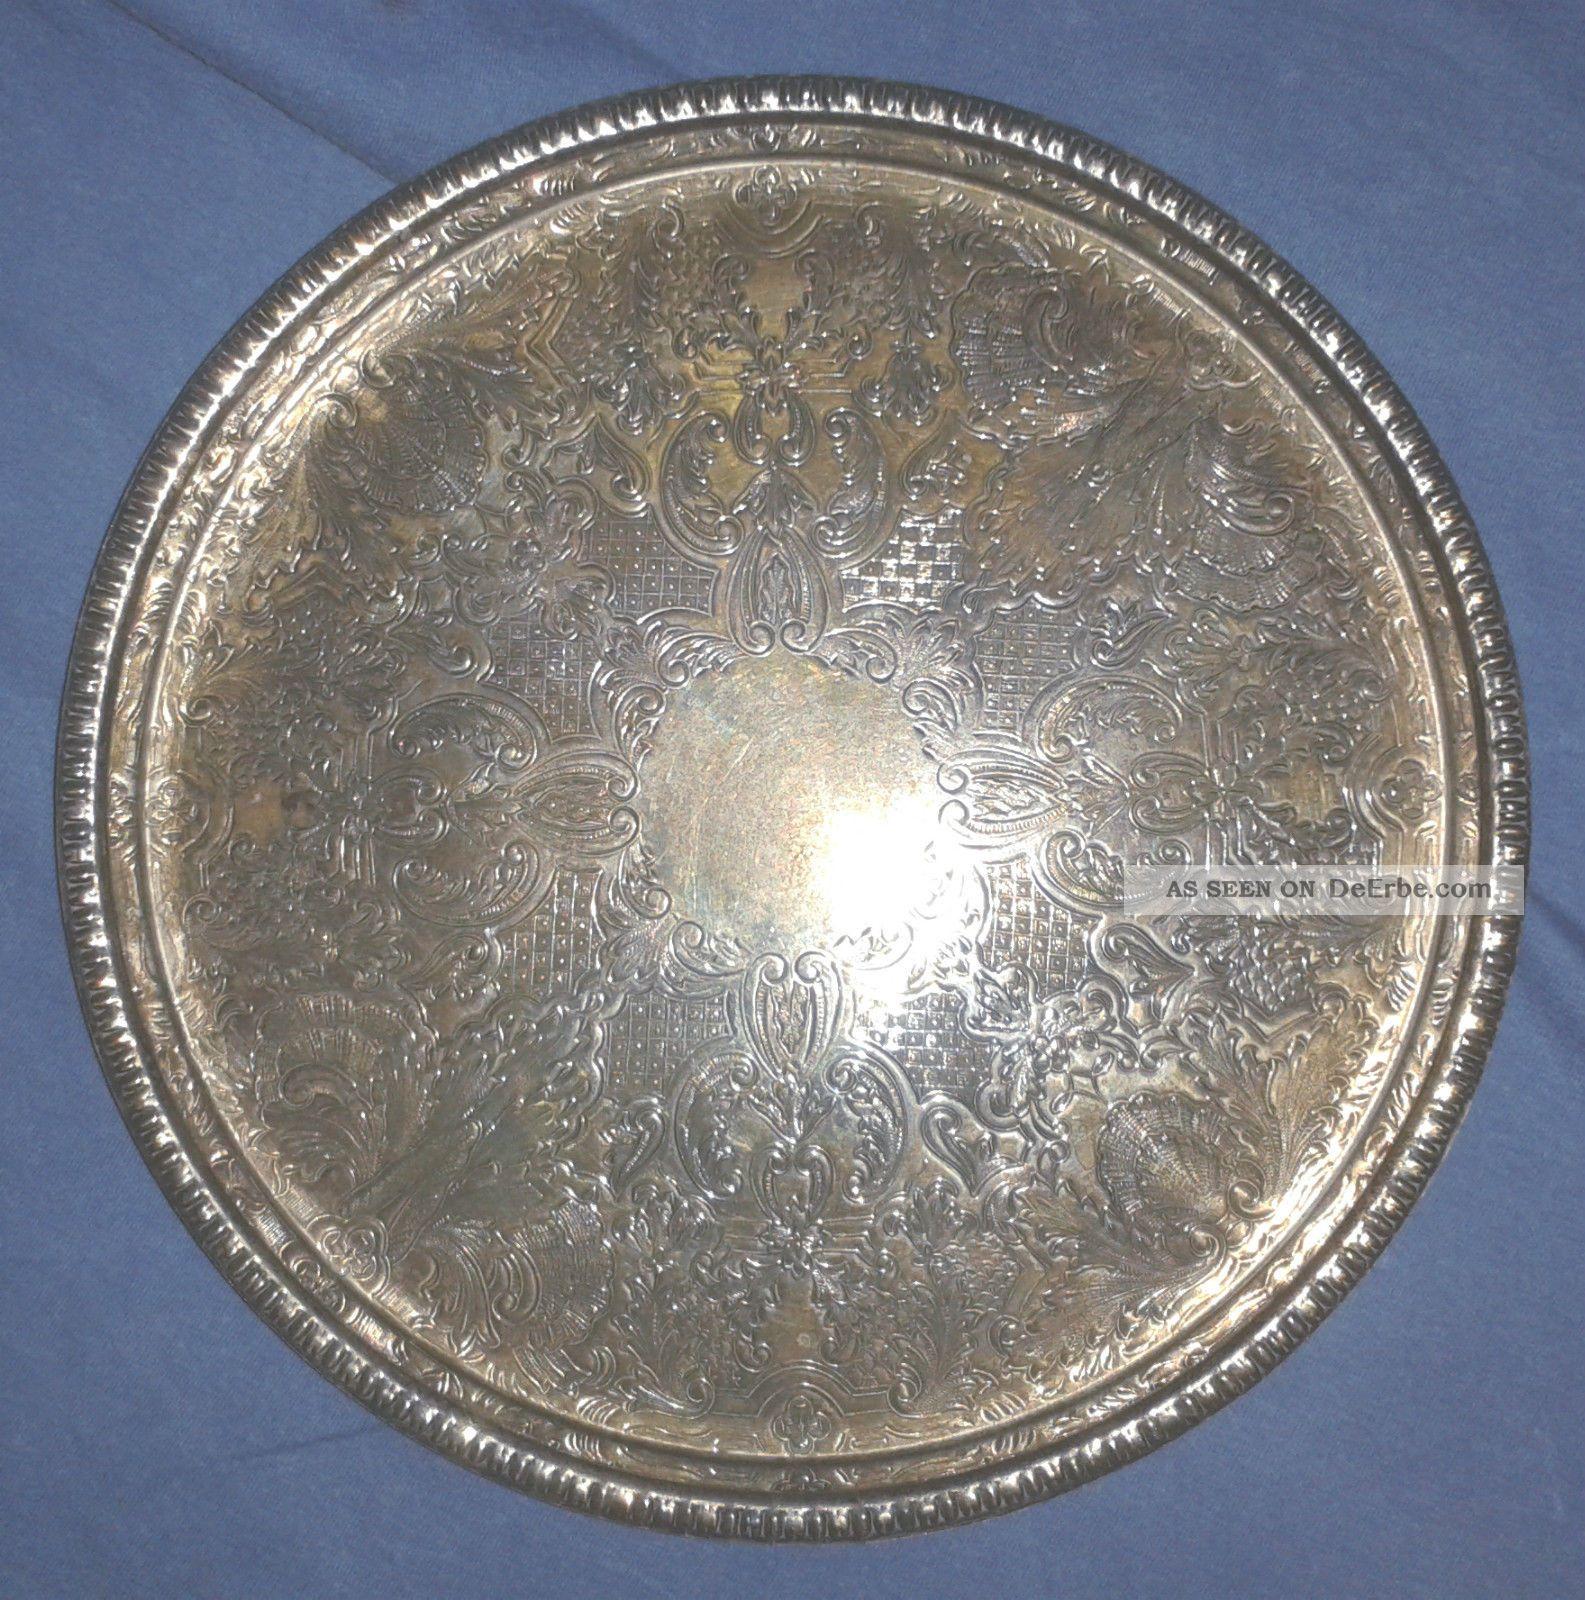 versilbertes tablett rund silver plated england antik silbertablett shabby chic. Black Bedroom Furniture Sets. Home Design Ideas